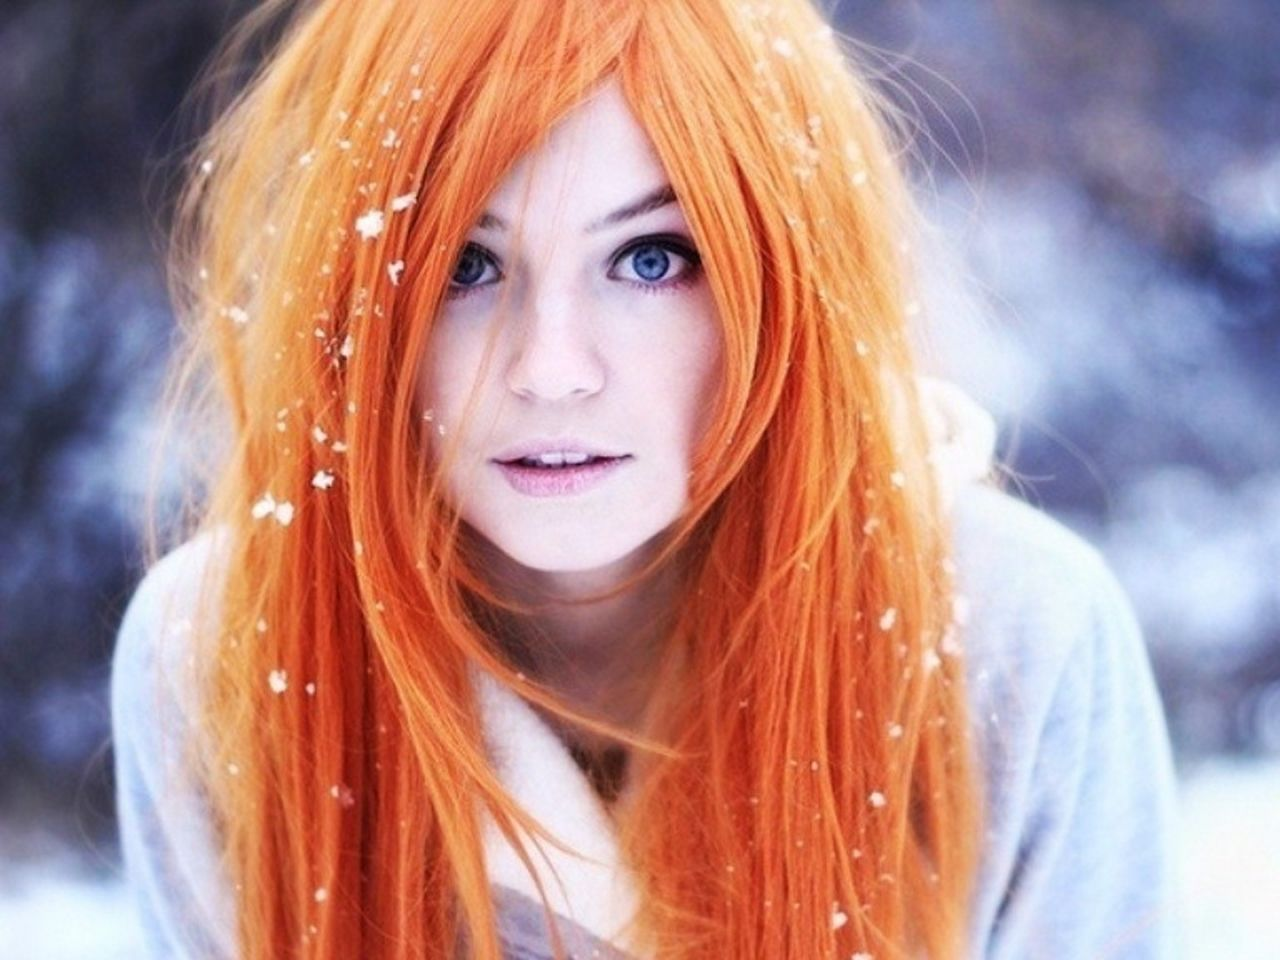 women winter snow cosplay blue eyes redheads people inoue